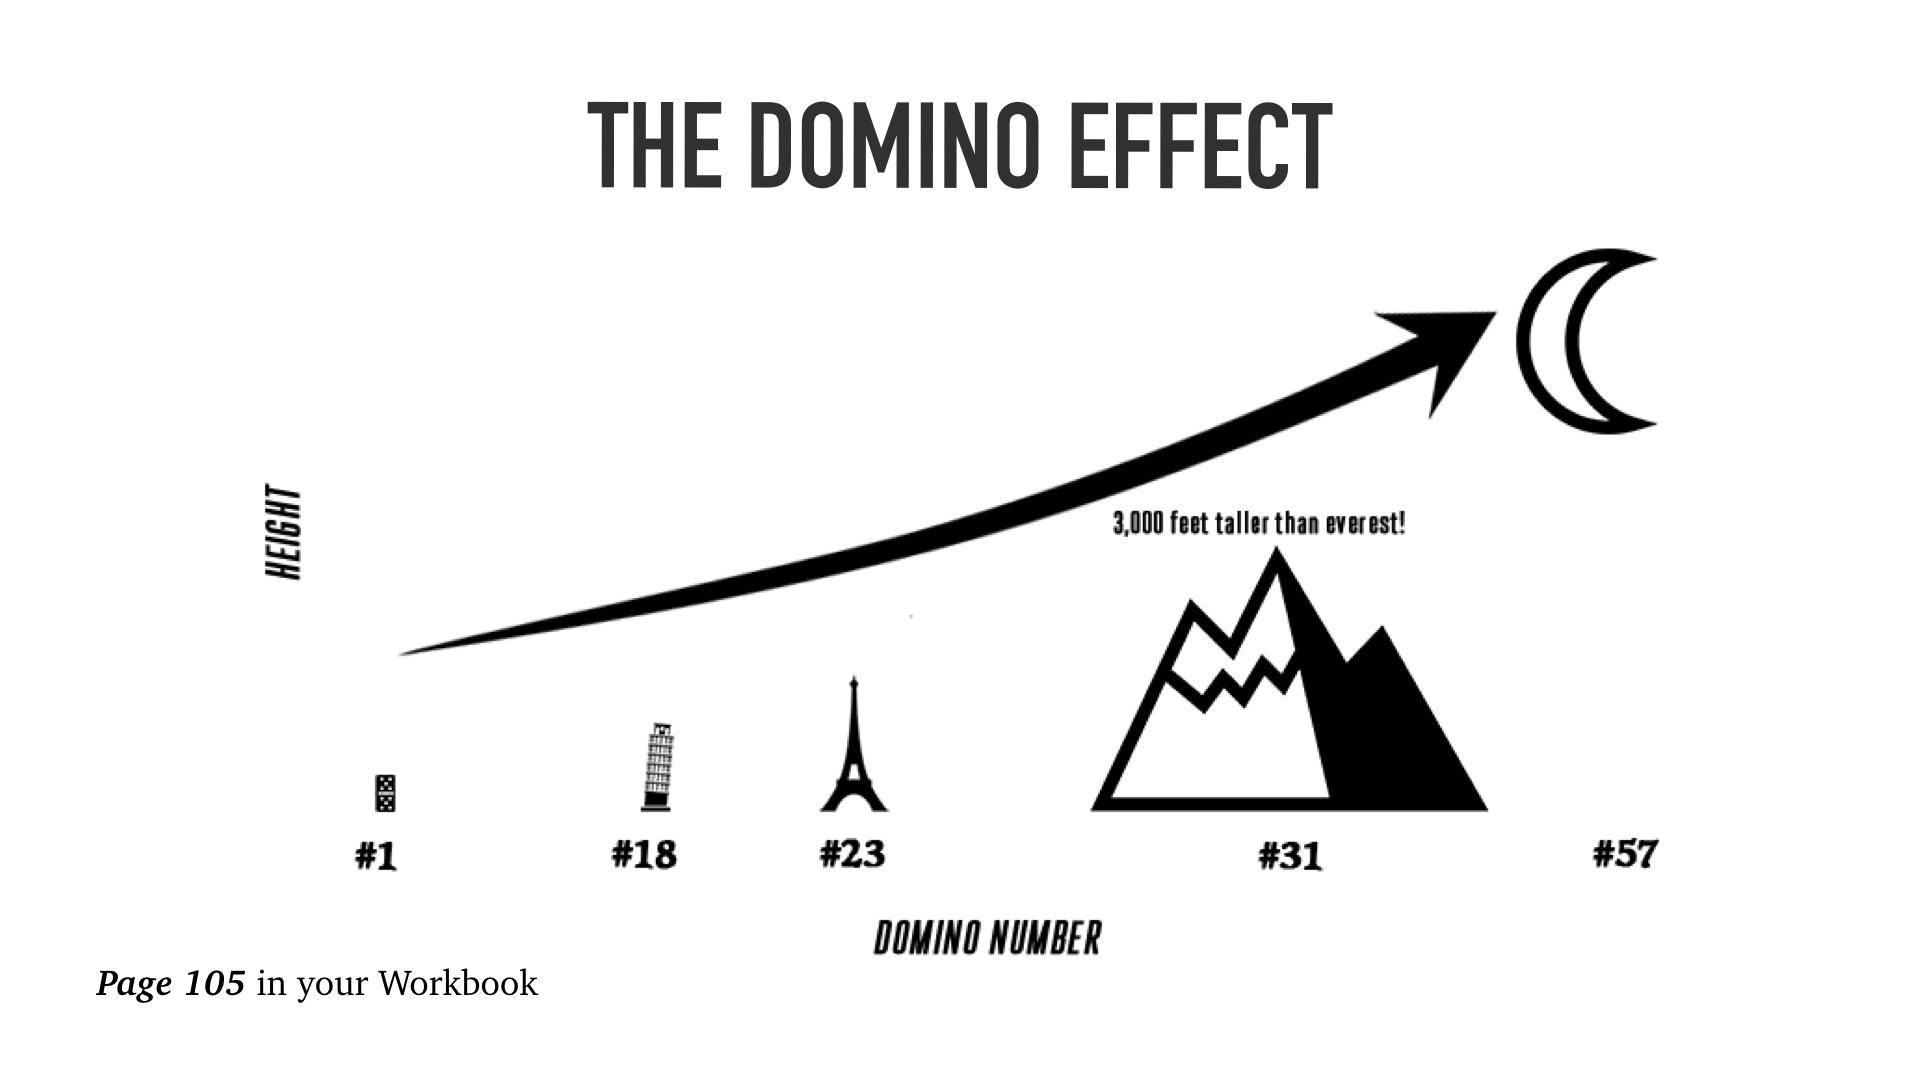 domino effect examples